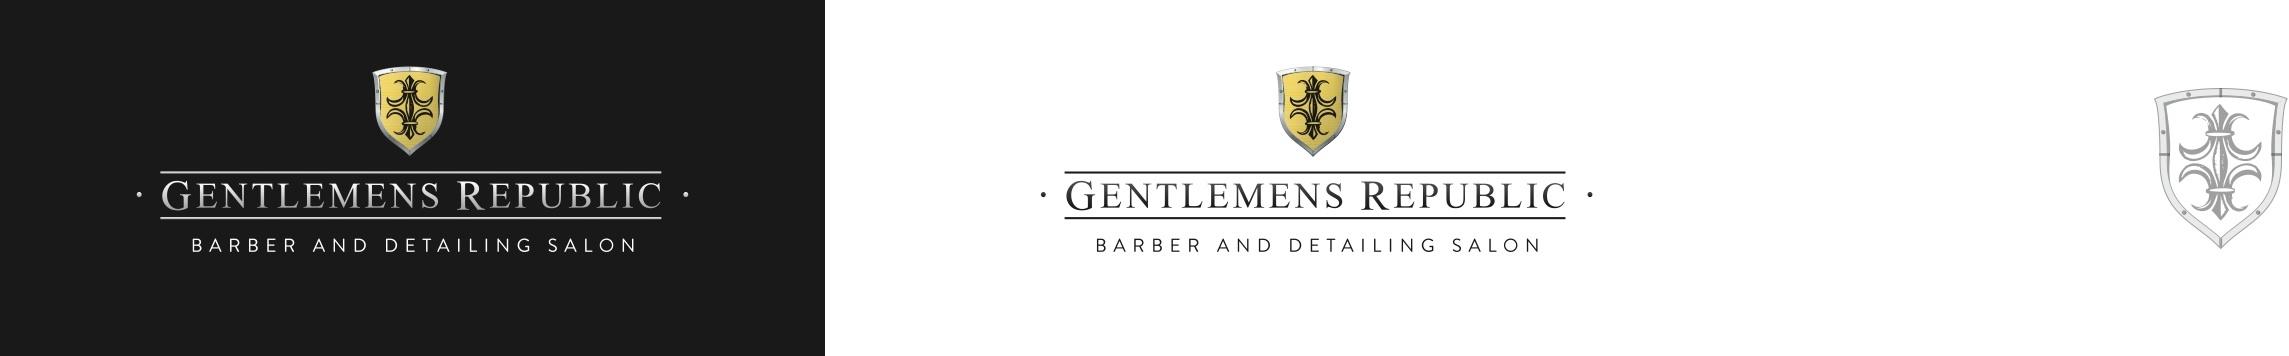 Gentlemens Republic Barber Salon